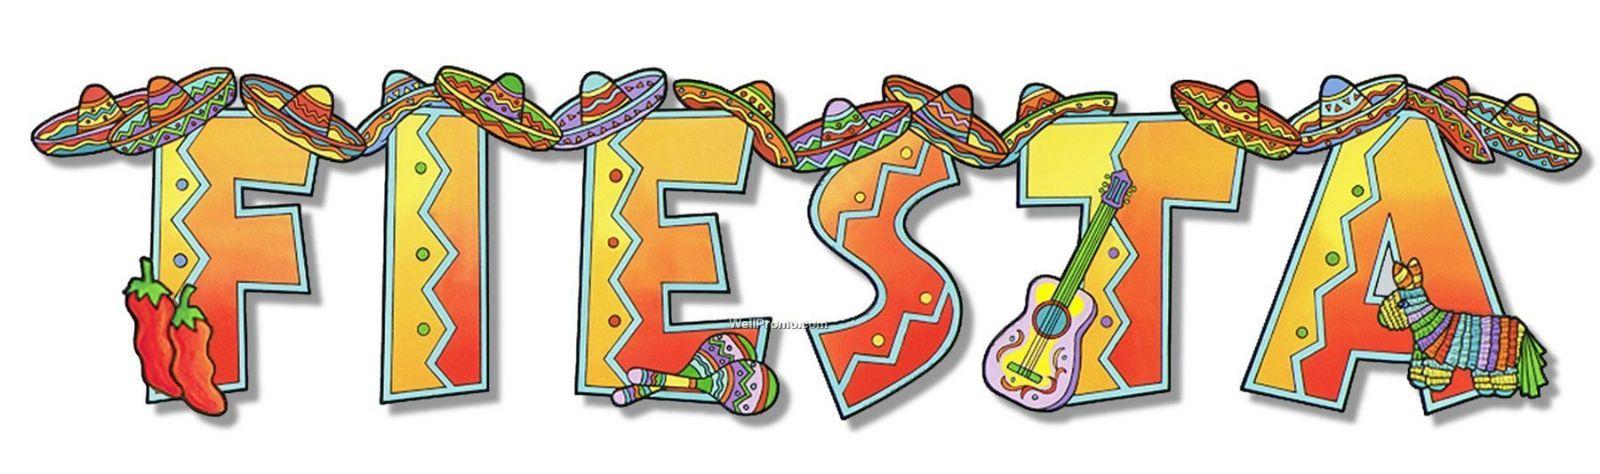 Fiesta clipart spring. Art free download best